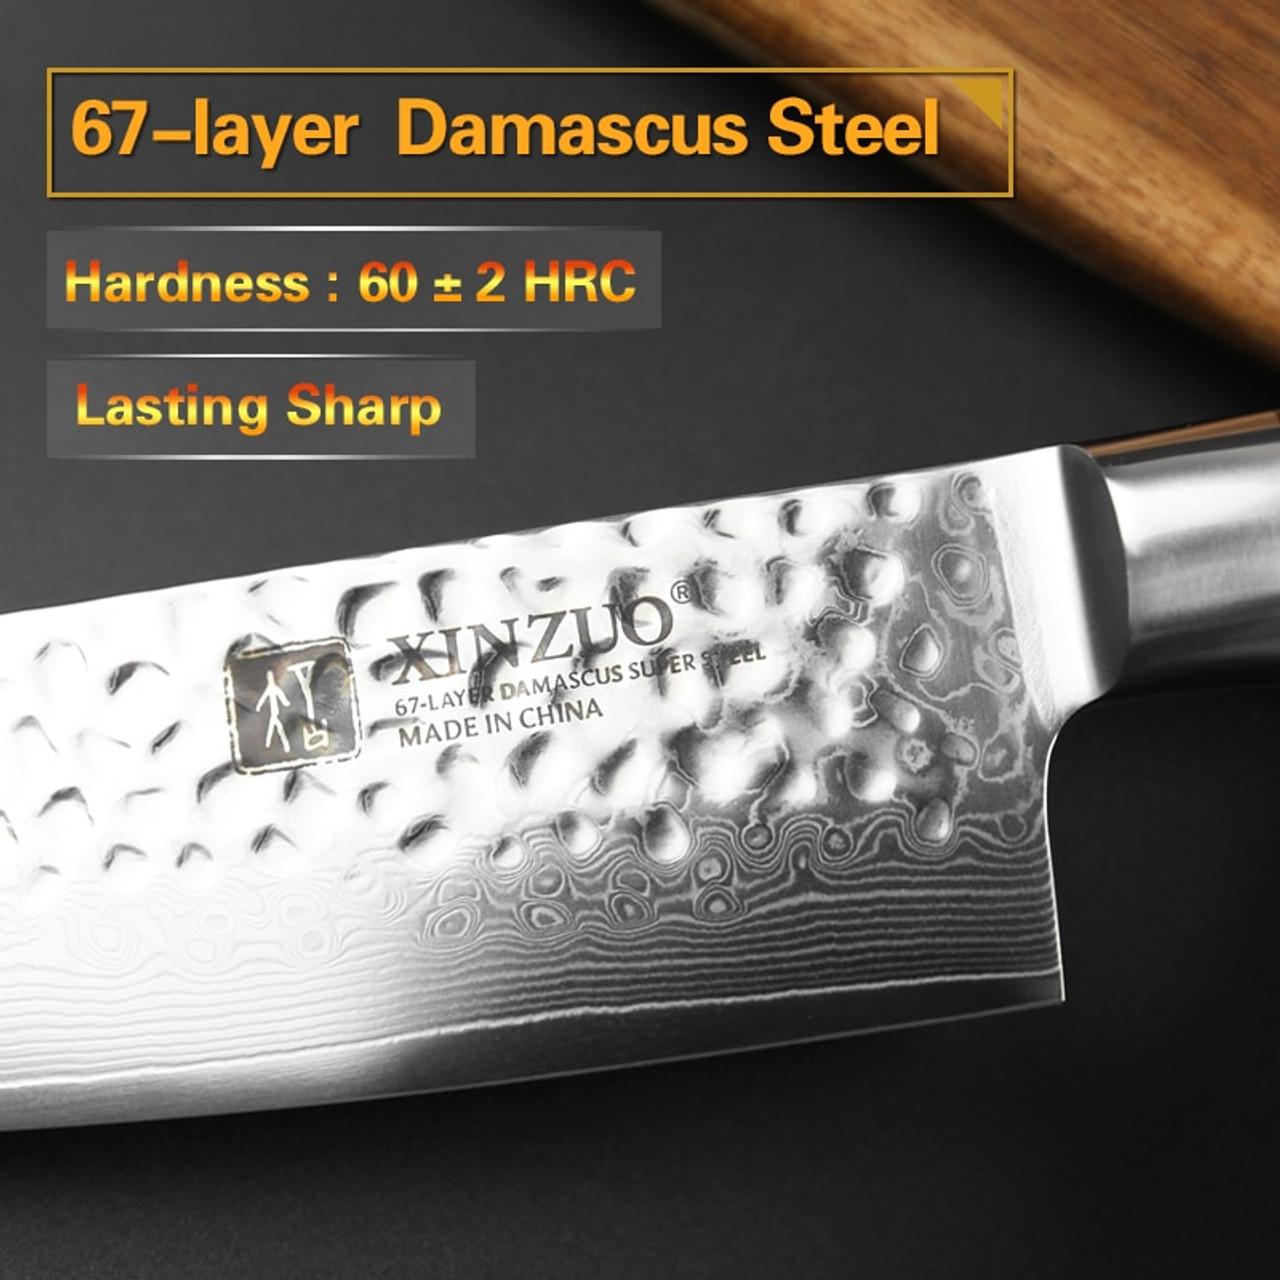 Xinzuo 8 Chef Knife Chinese 67 Layers Damascus Steel Kitchen Knife Newarrive Professional Vg10 Cooking Knife Pakkawood Handle